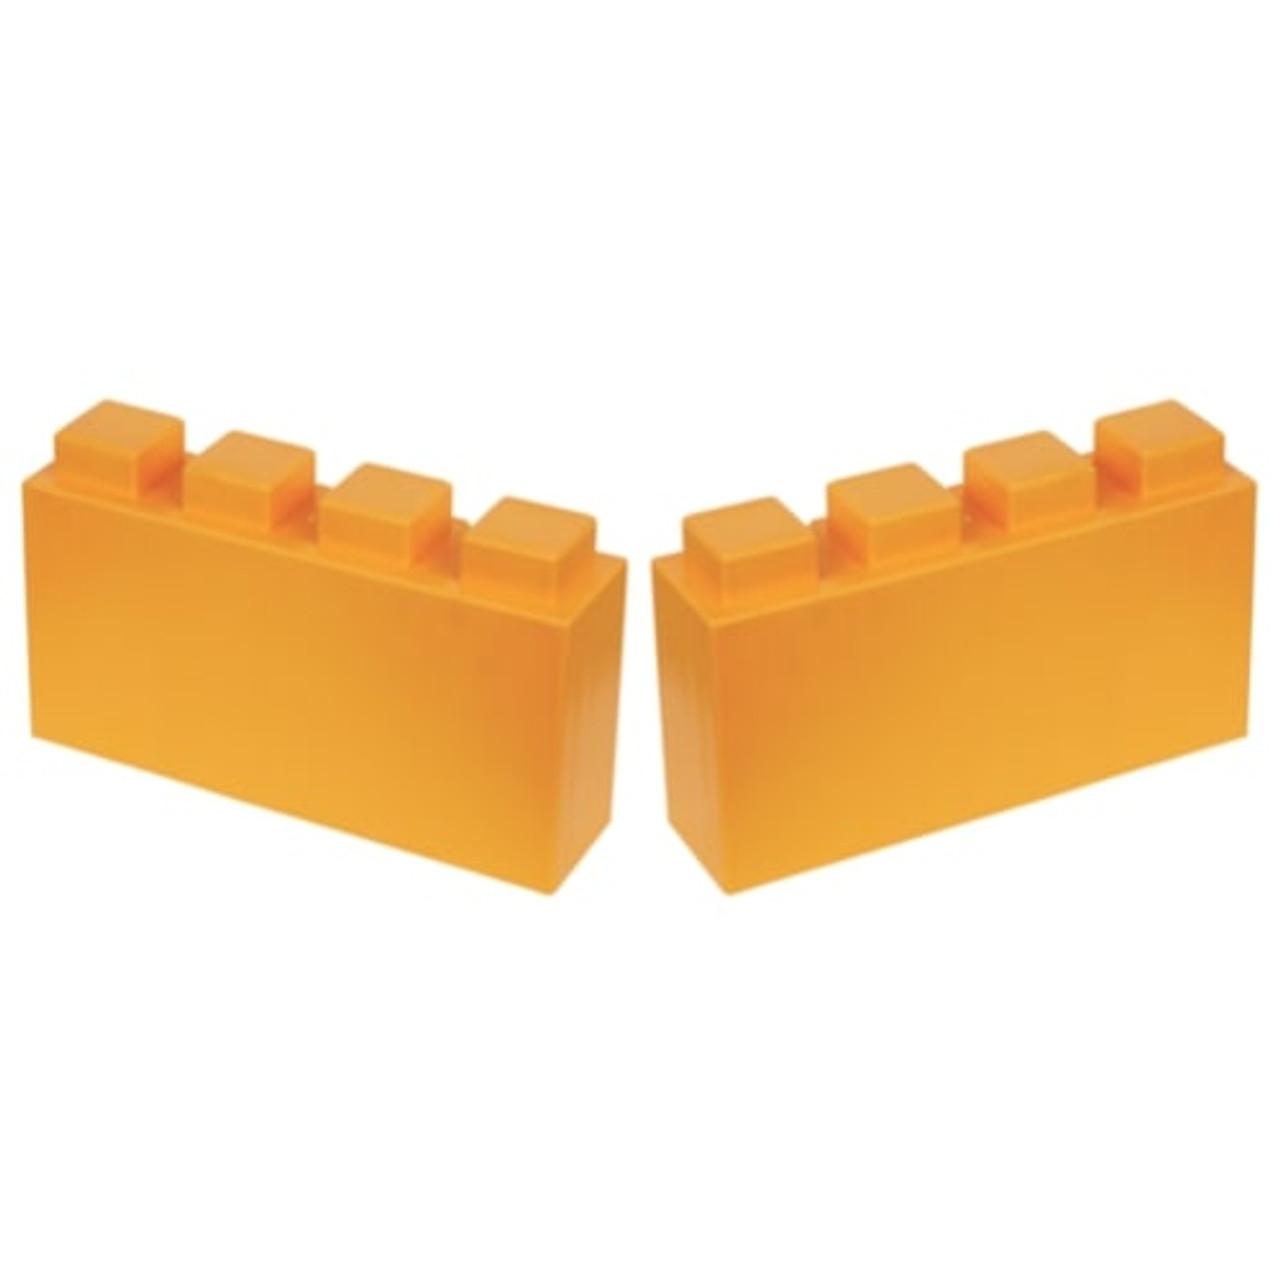 "12"" x 3"" Line Block Bulk Pack - 8 Blocks"